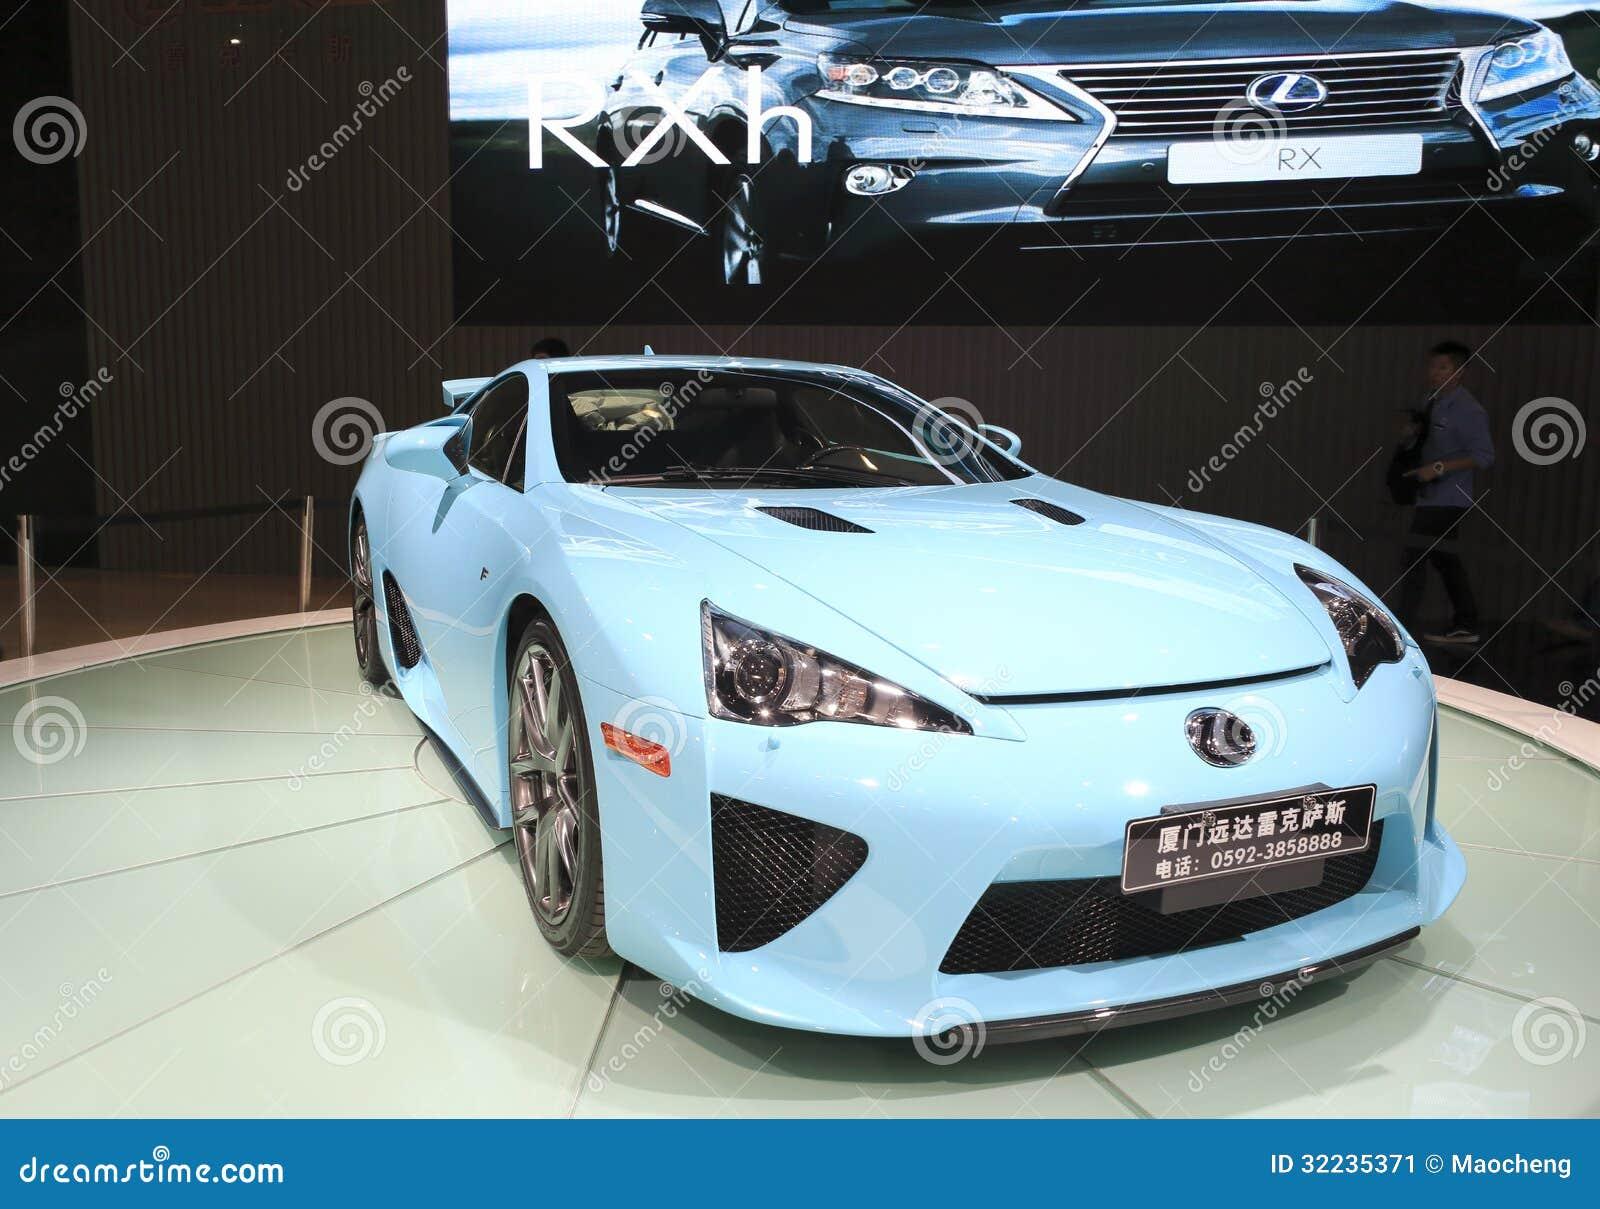 Merveilleux Cyan Lexus Lfa Car Stock Image